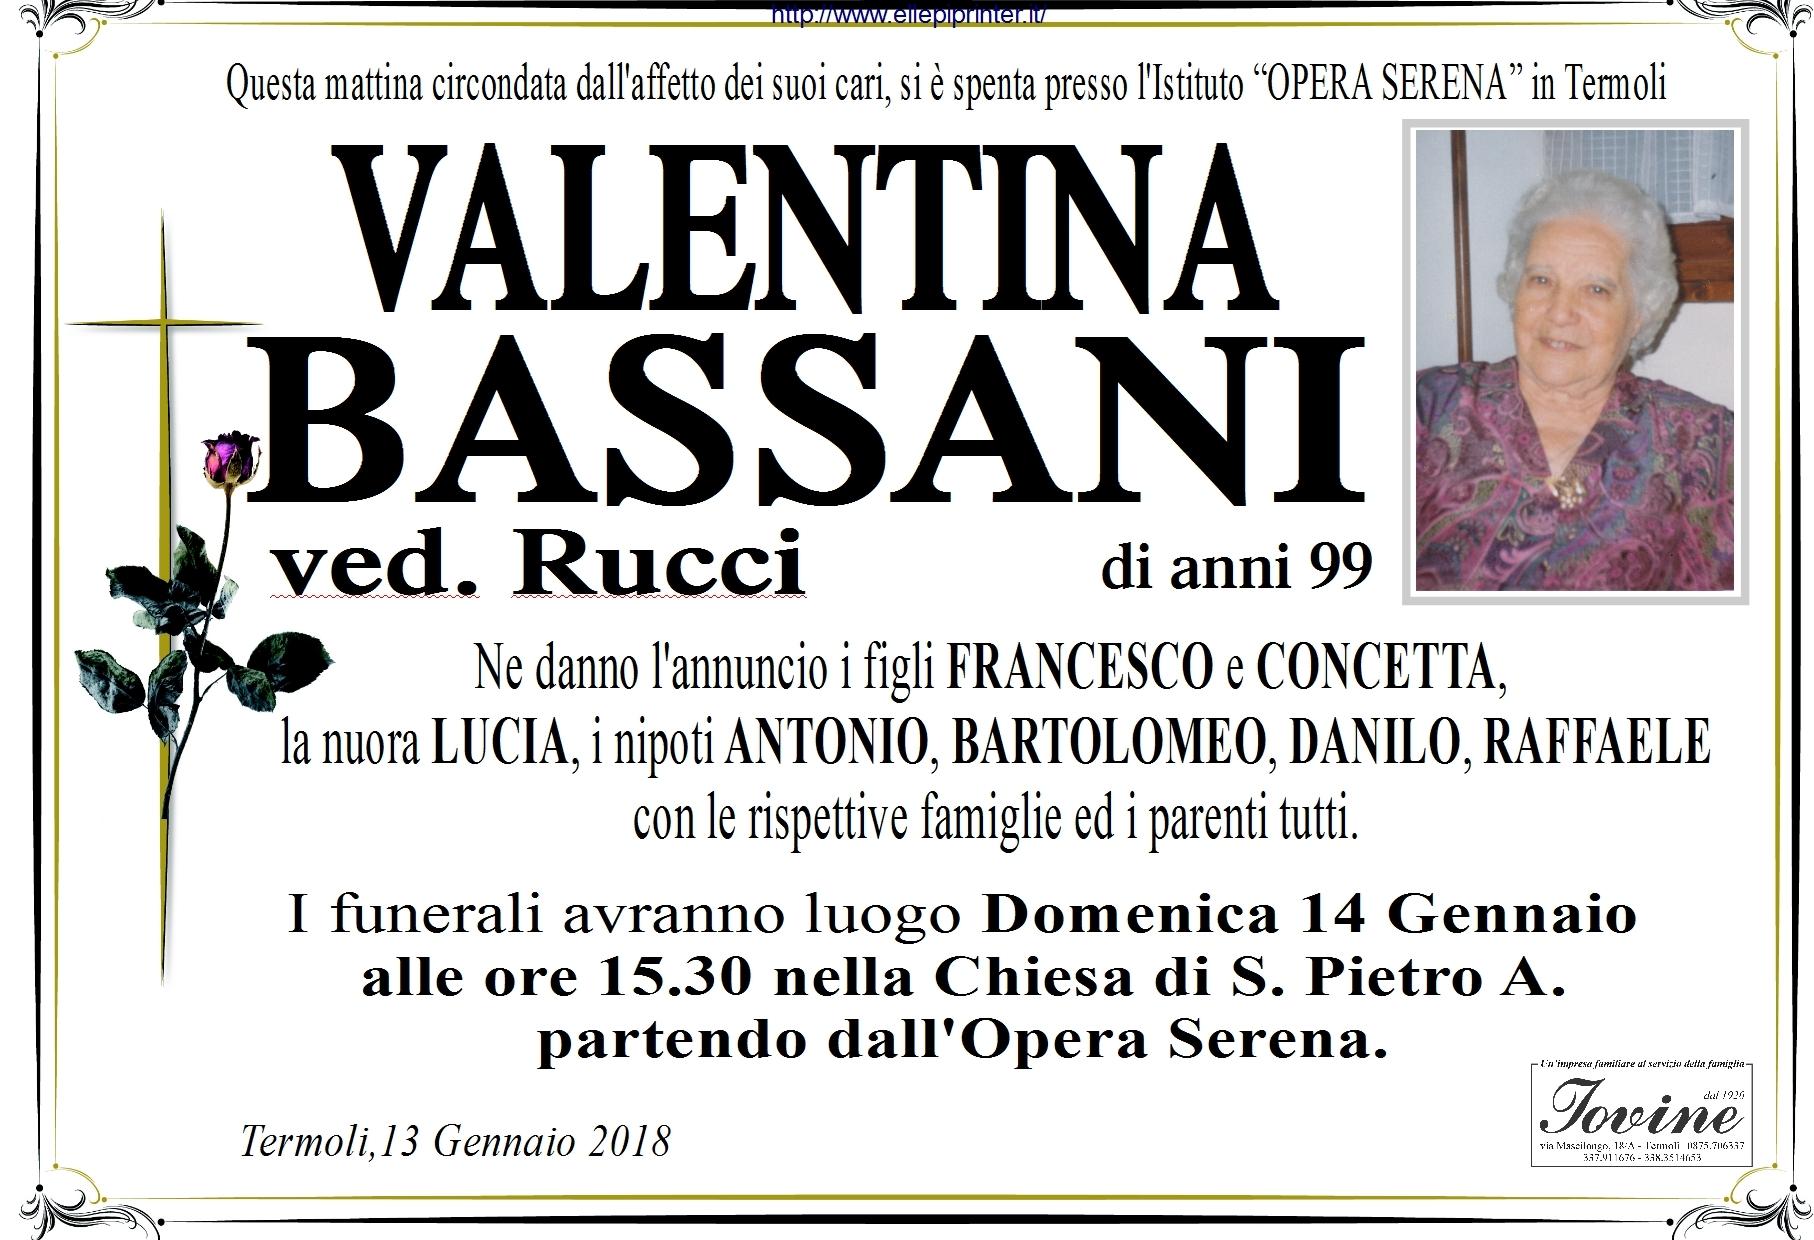 Valentina Bassani, 13/01/2018, Termoli – Onoranze Funebri Iovine